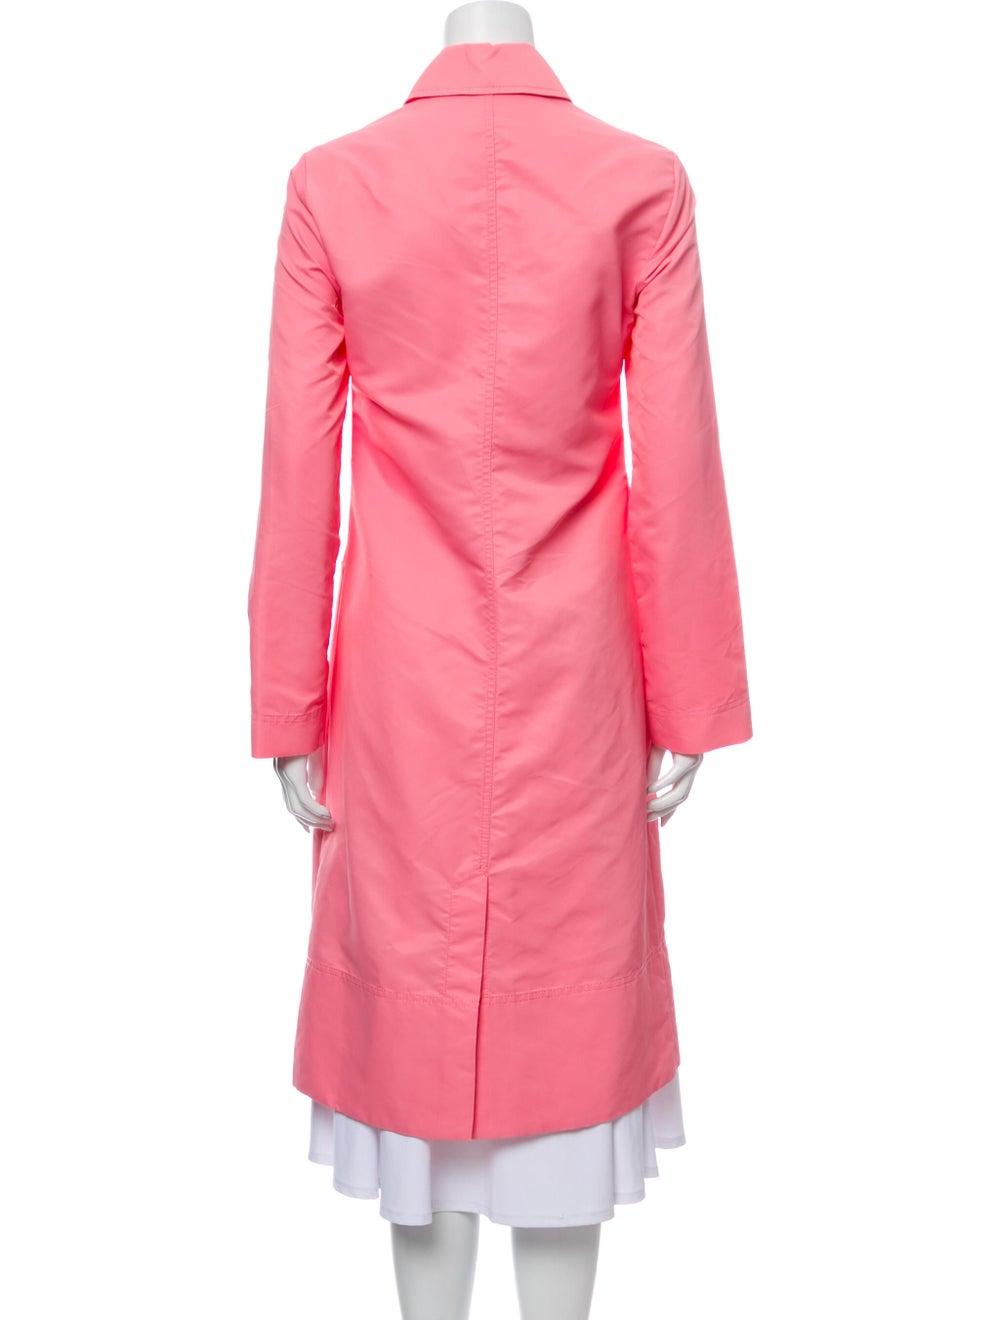 Staud Trench Coat Pink - image 3